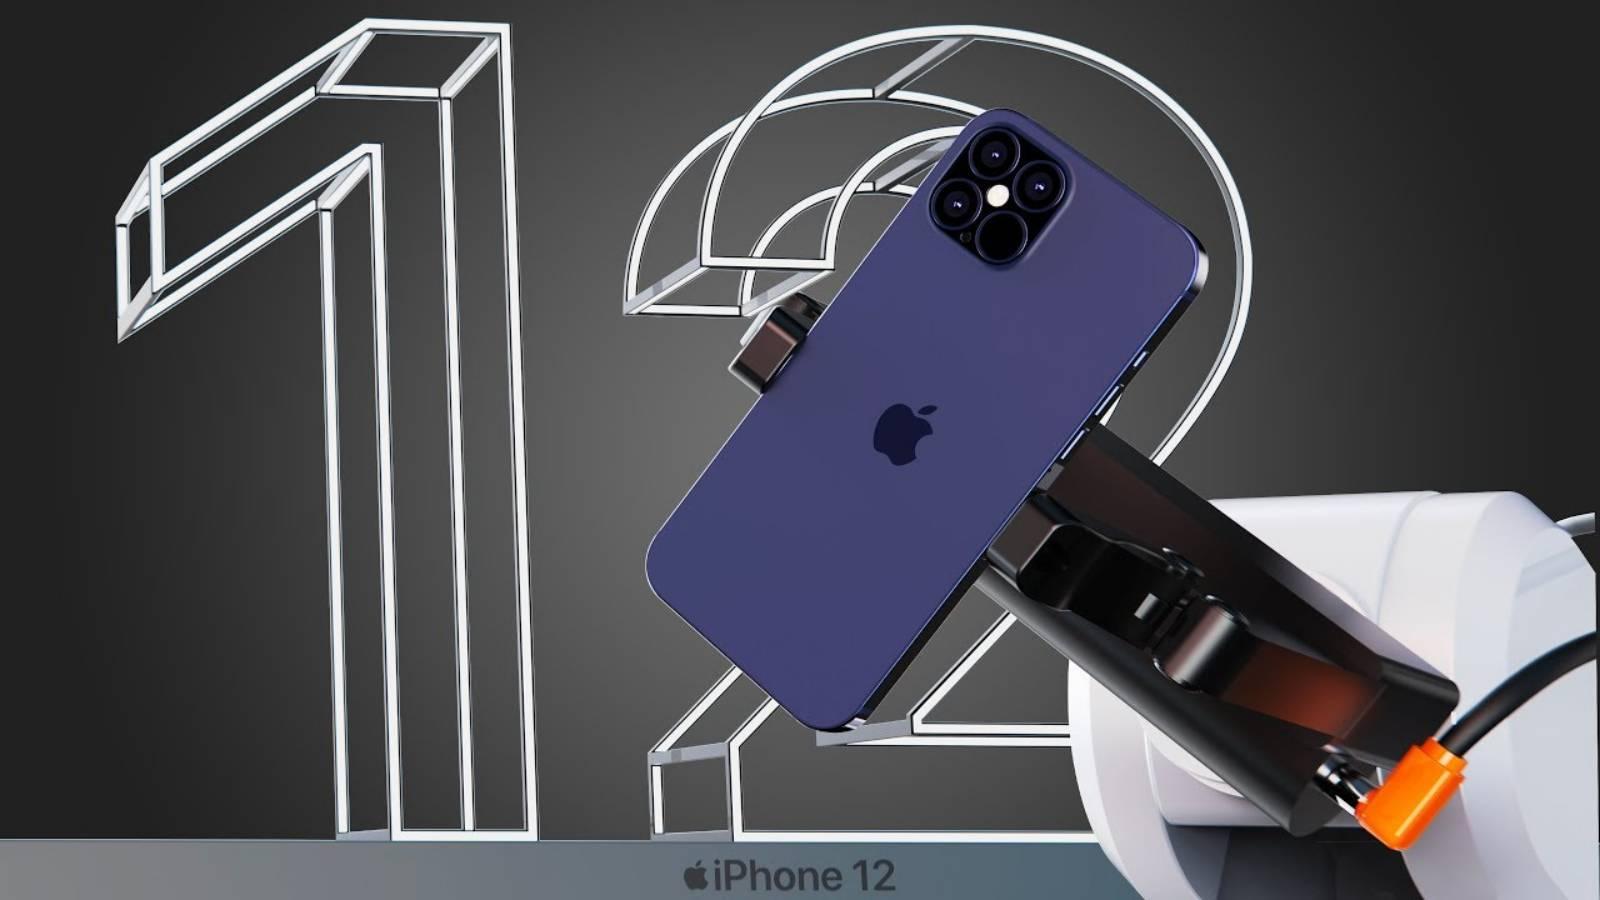 iphone 12 ram